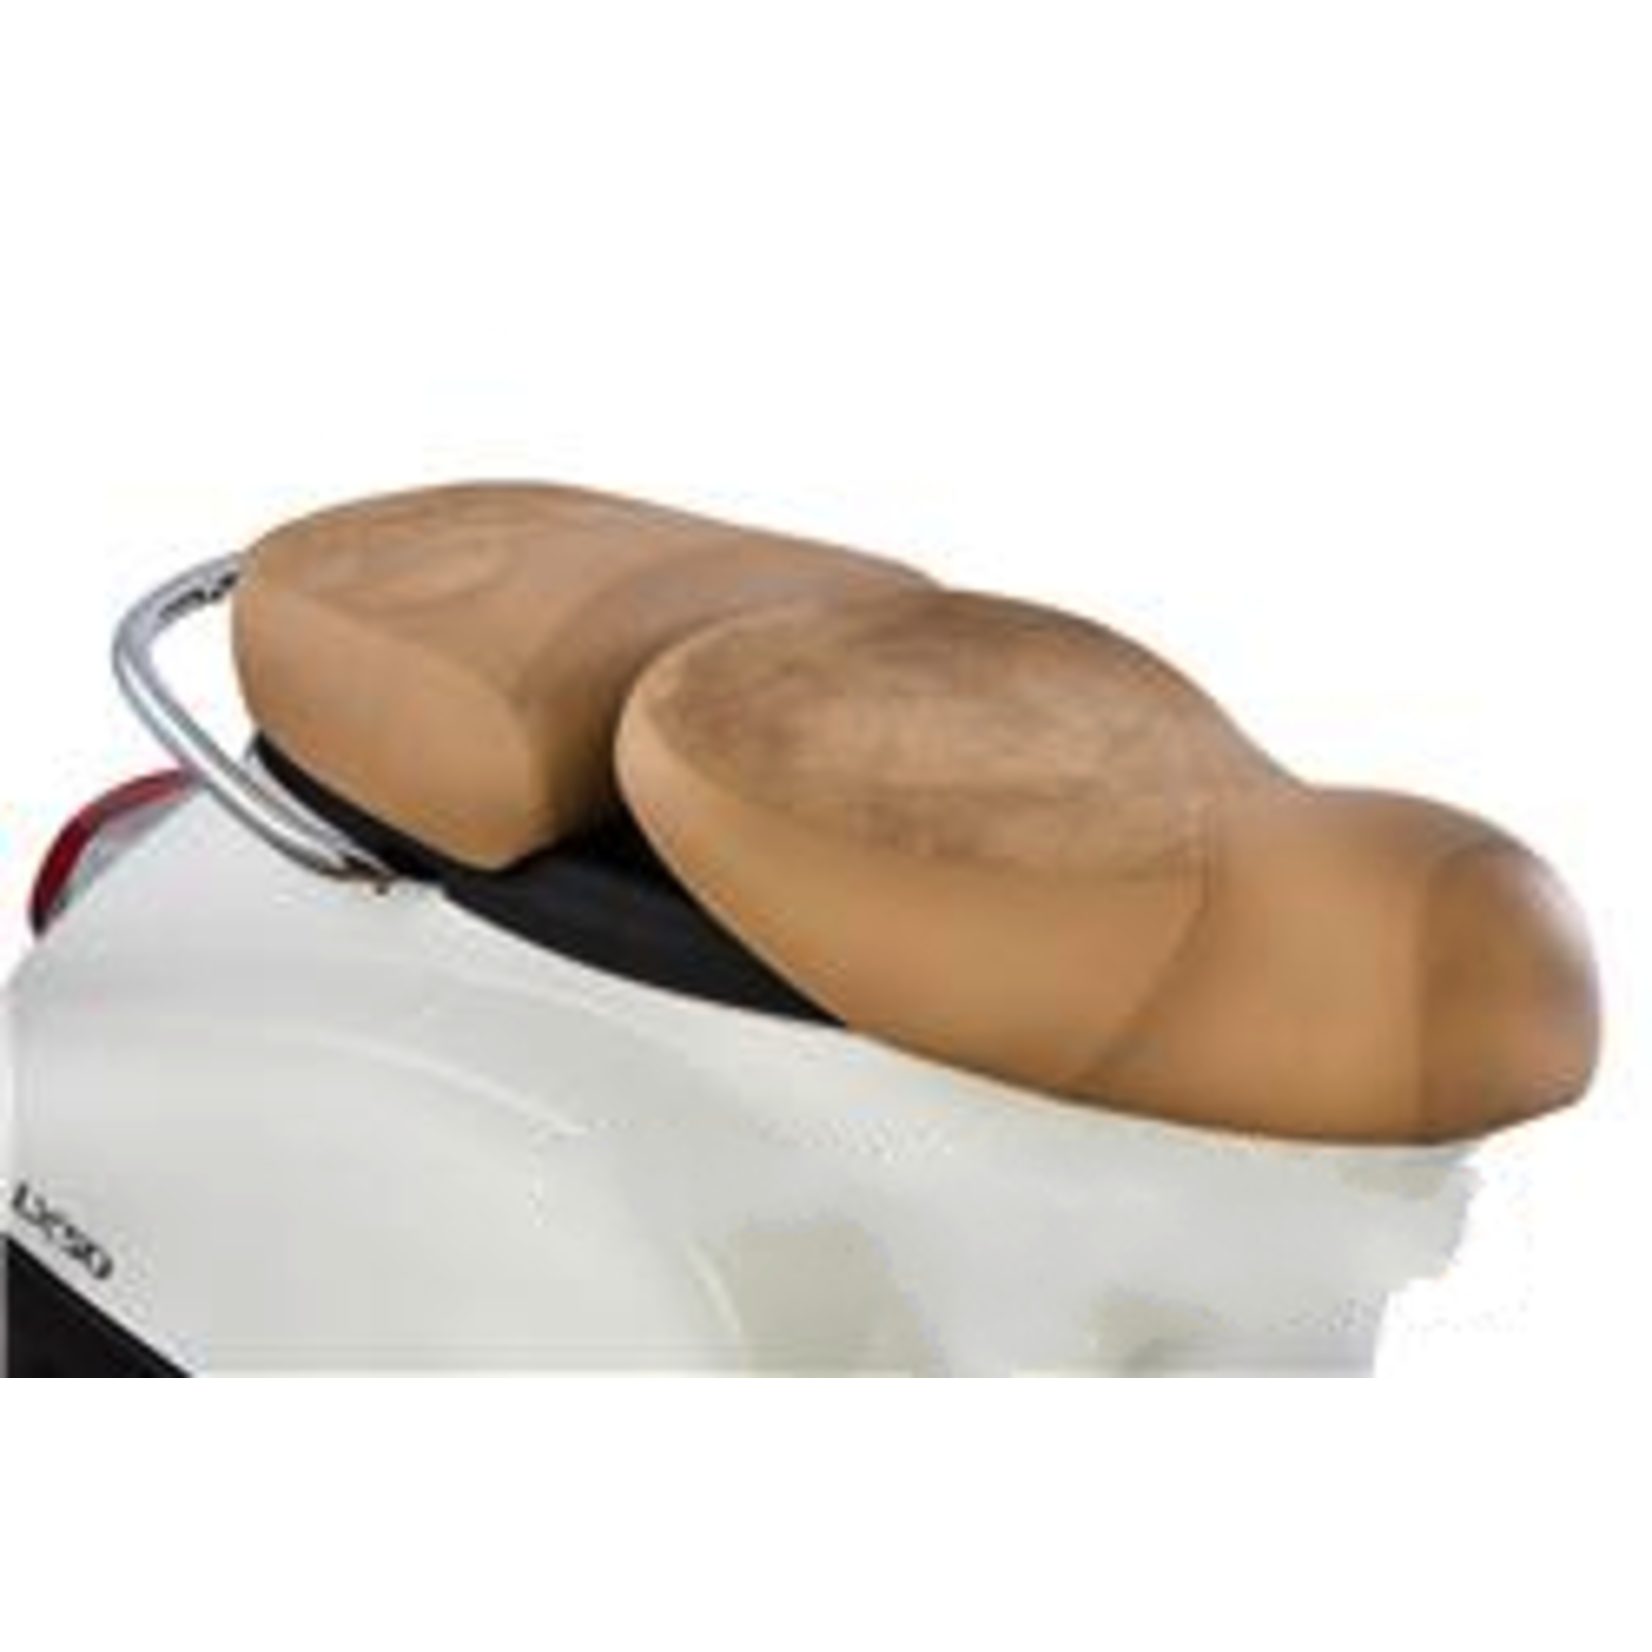 Accessories Saddle, LXV Saddle/Buddy Beige